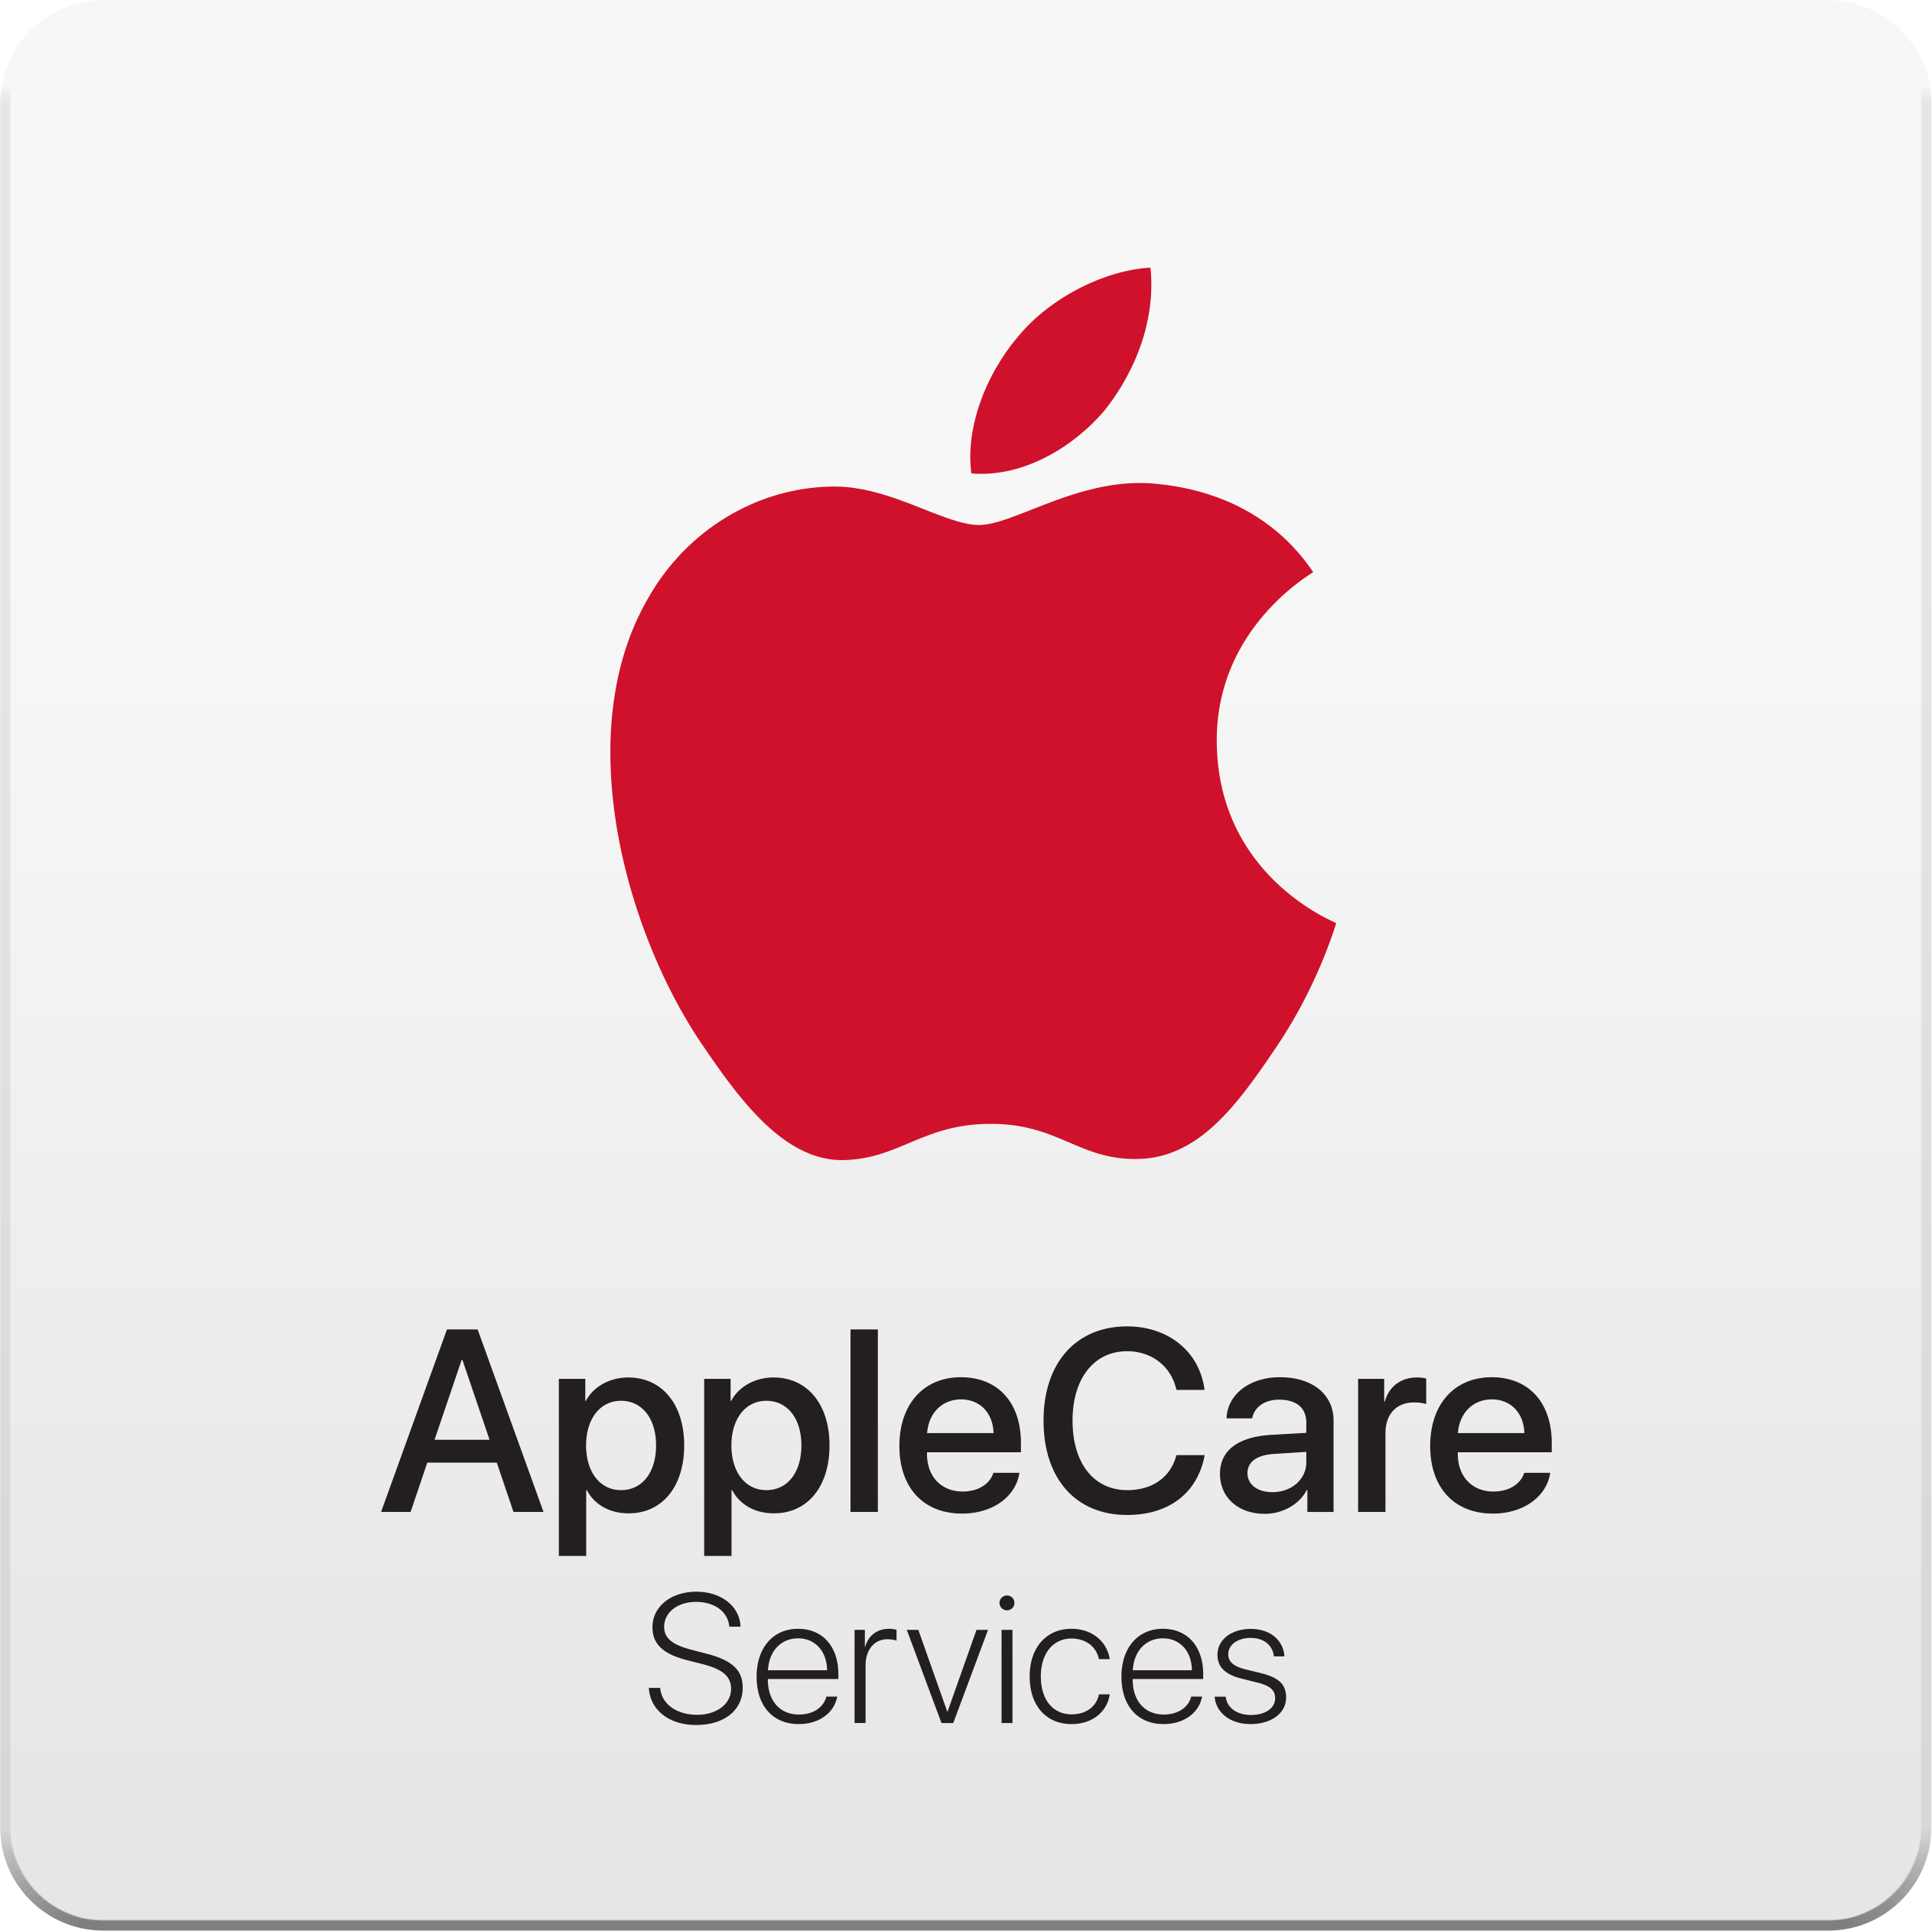 AppleCare Services logo